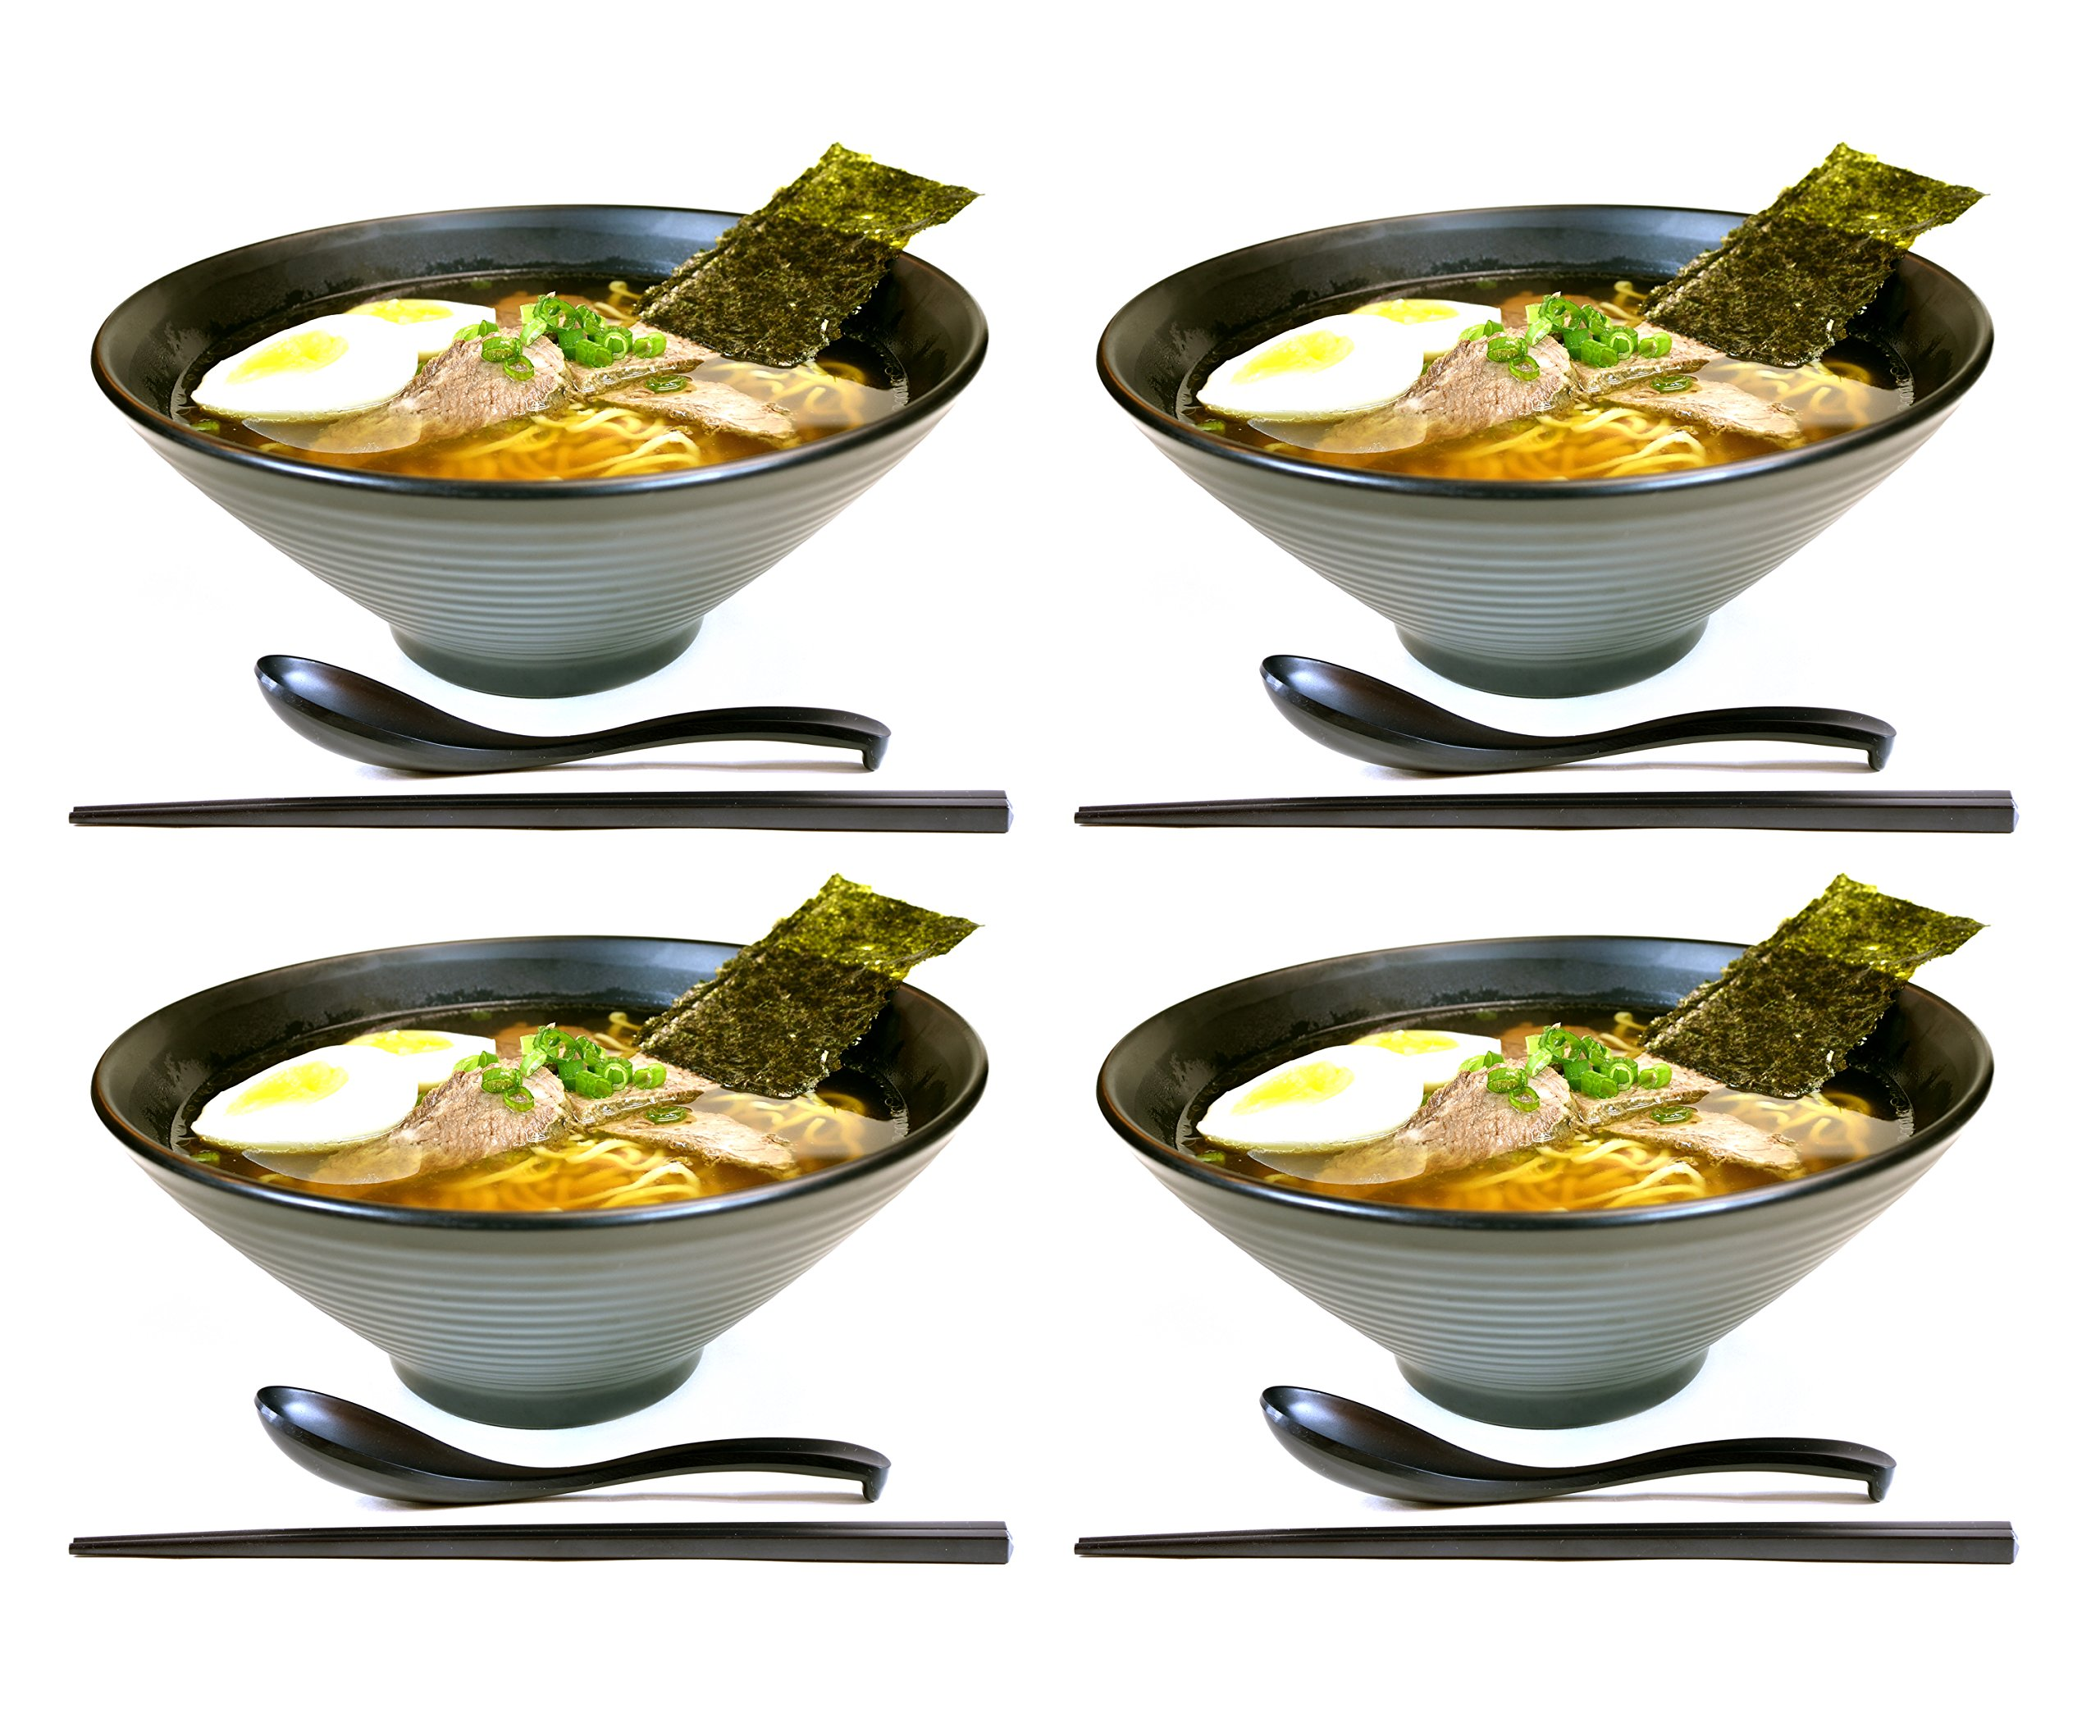 4 sets (12 piece) Large Japanese Ramen Noodle Soup Bowl Melamine Hard Plastic Dishware Set with Matching Spoon and Chopsticks for Udon Soba Pho Asian Noodles (4, Black)